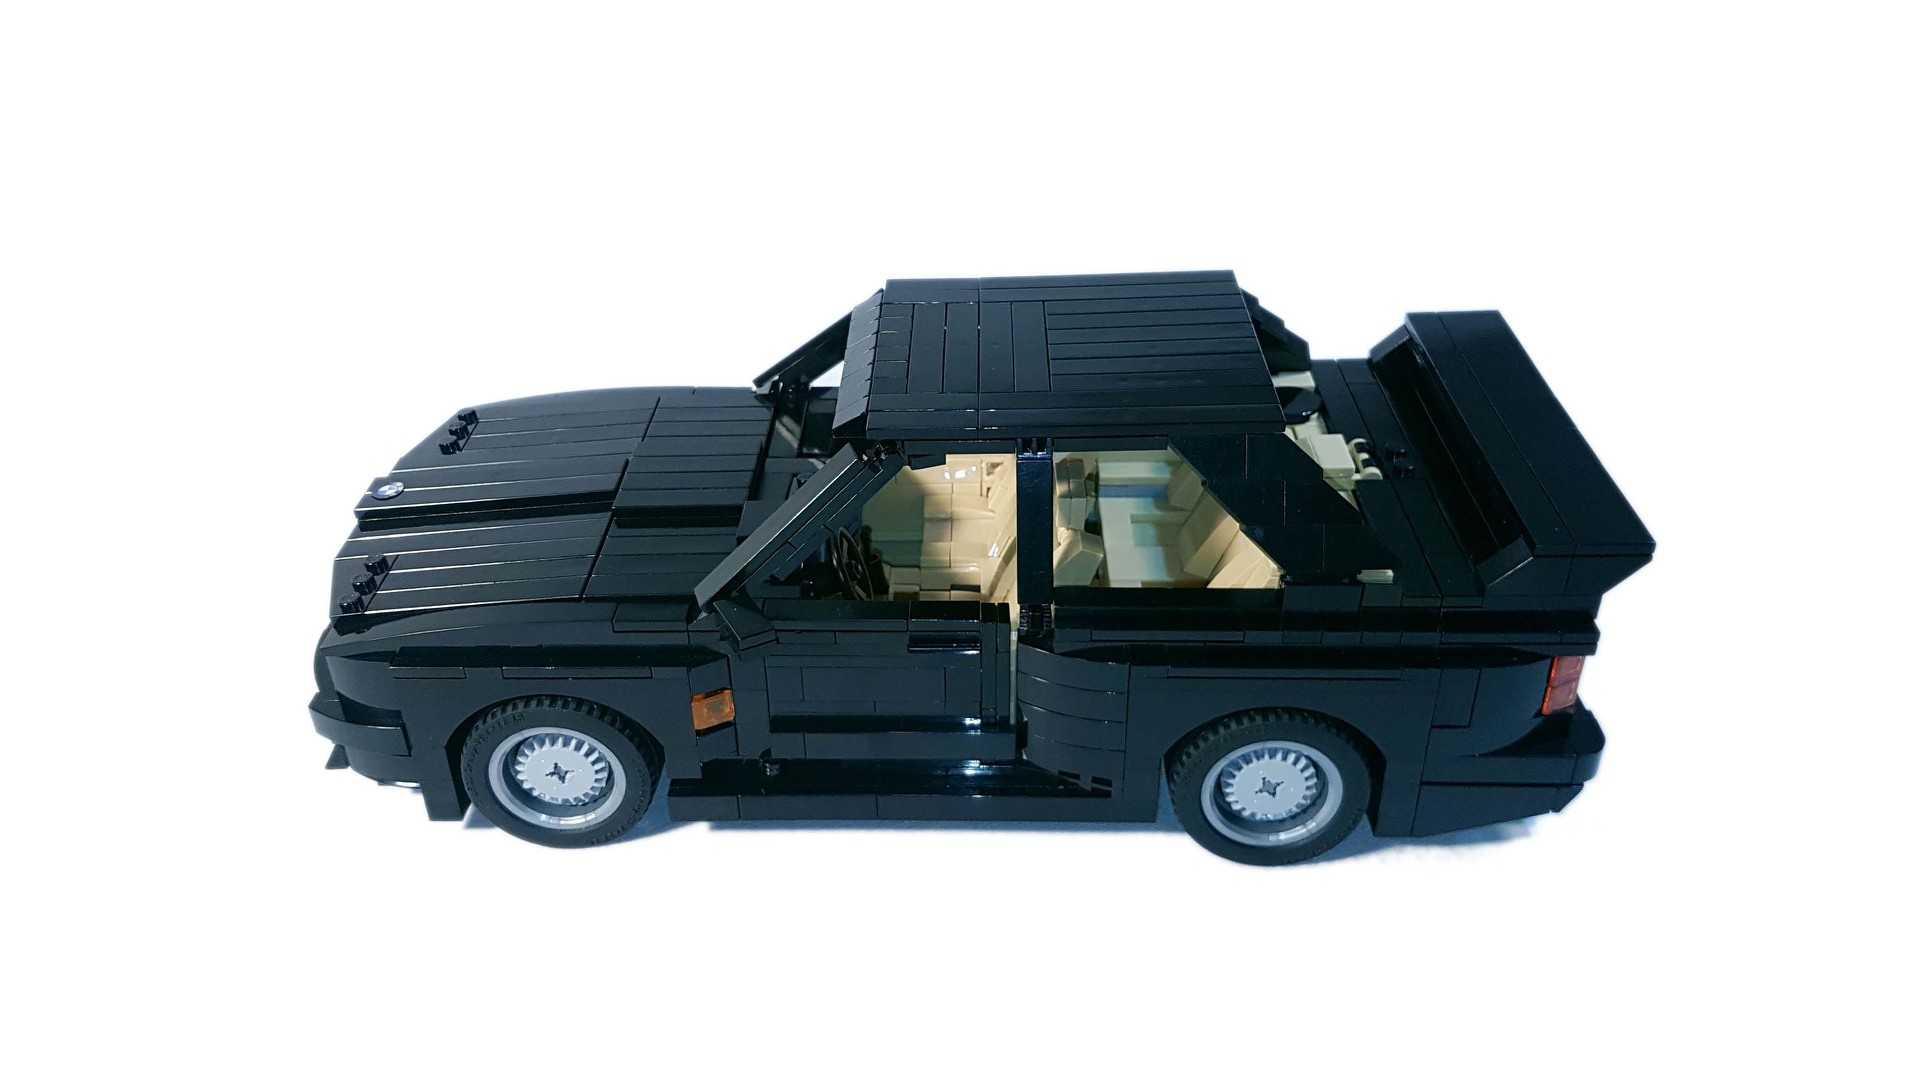 BMW E30 M3 Lego Ideas (28)